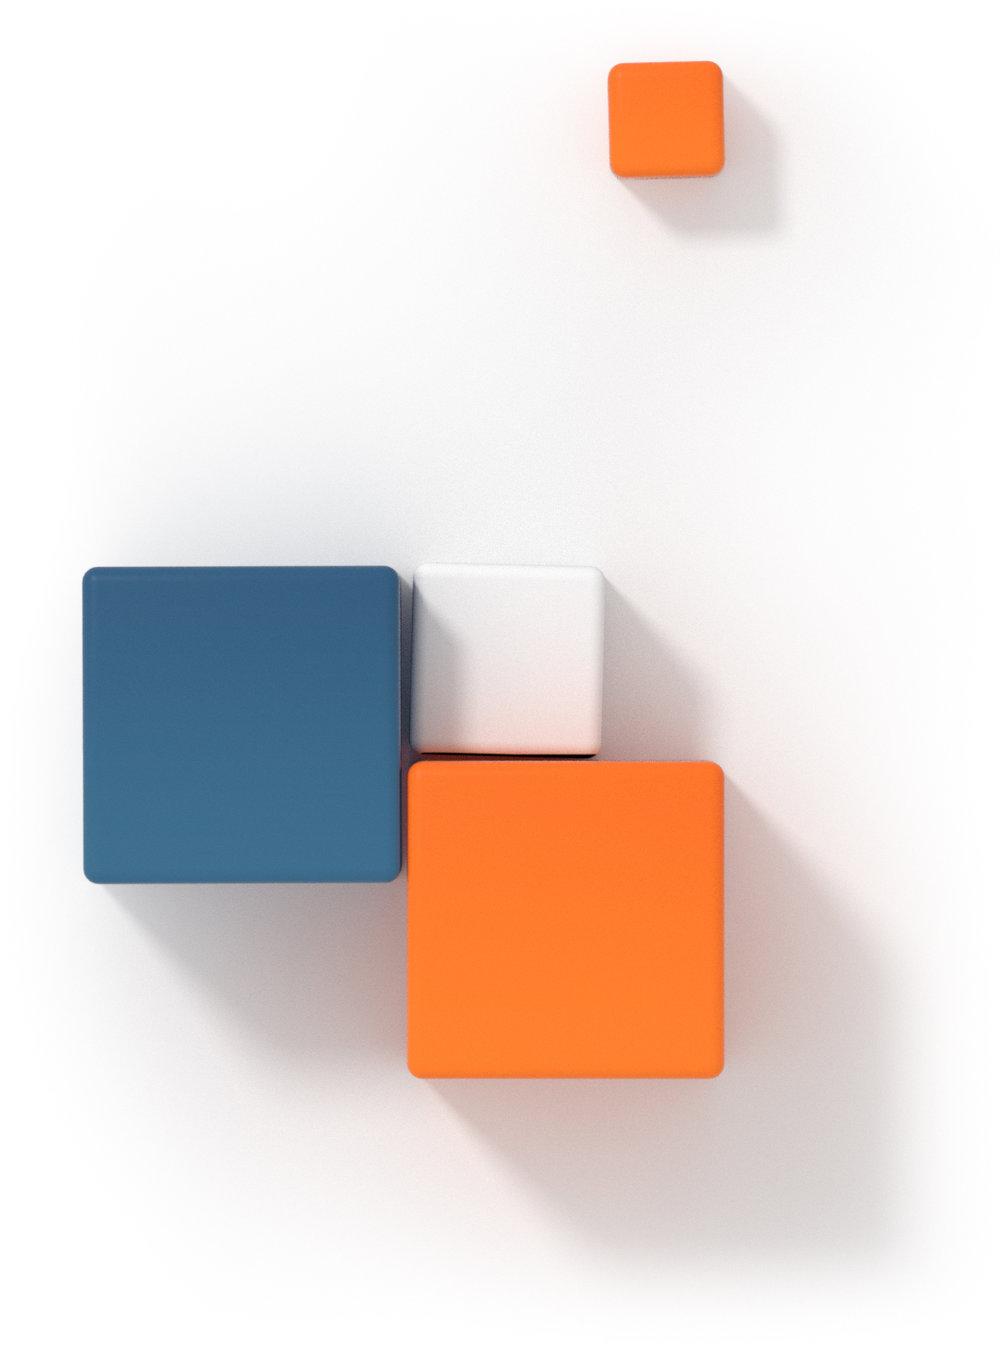 Design LockUp 1.jpg